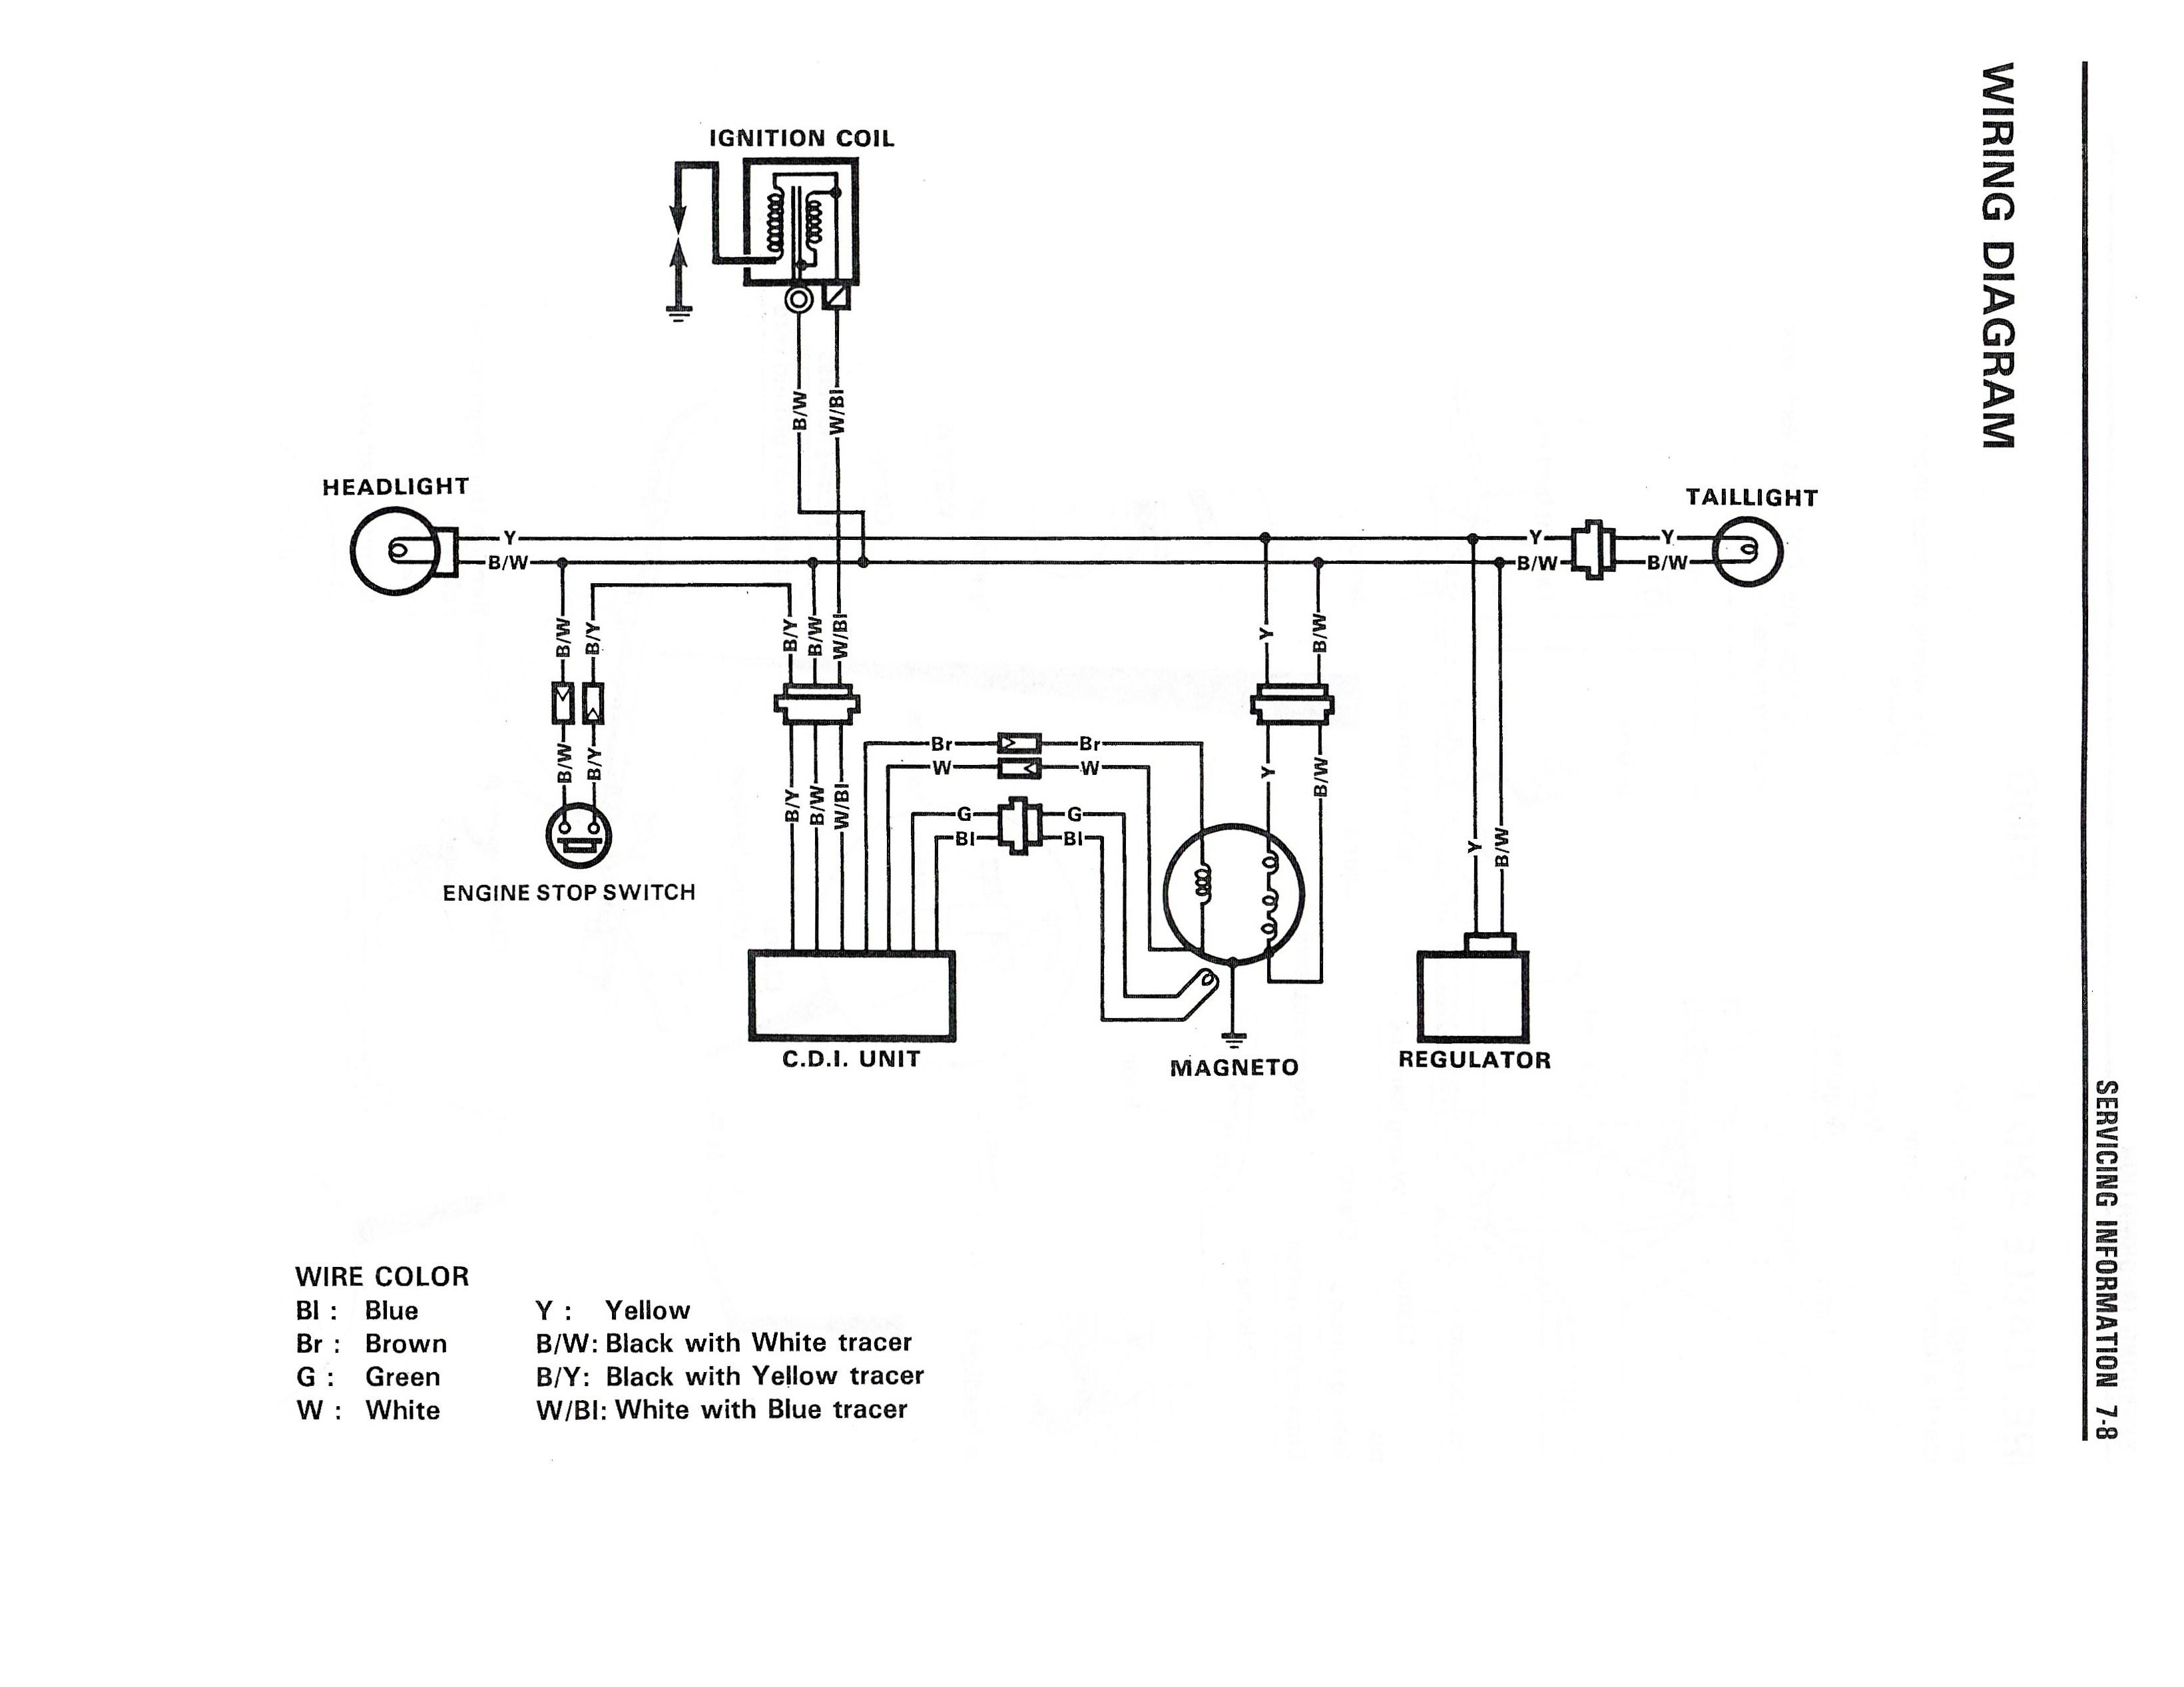 suzuki dr 250 wiring diagram - wiring diagrams database  diamond car service